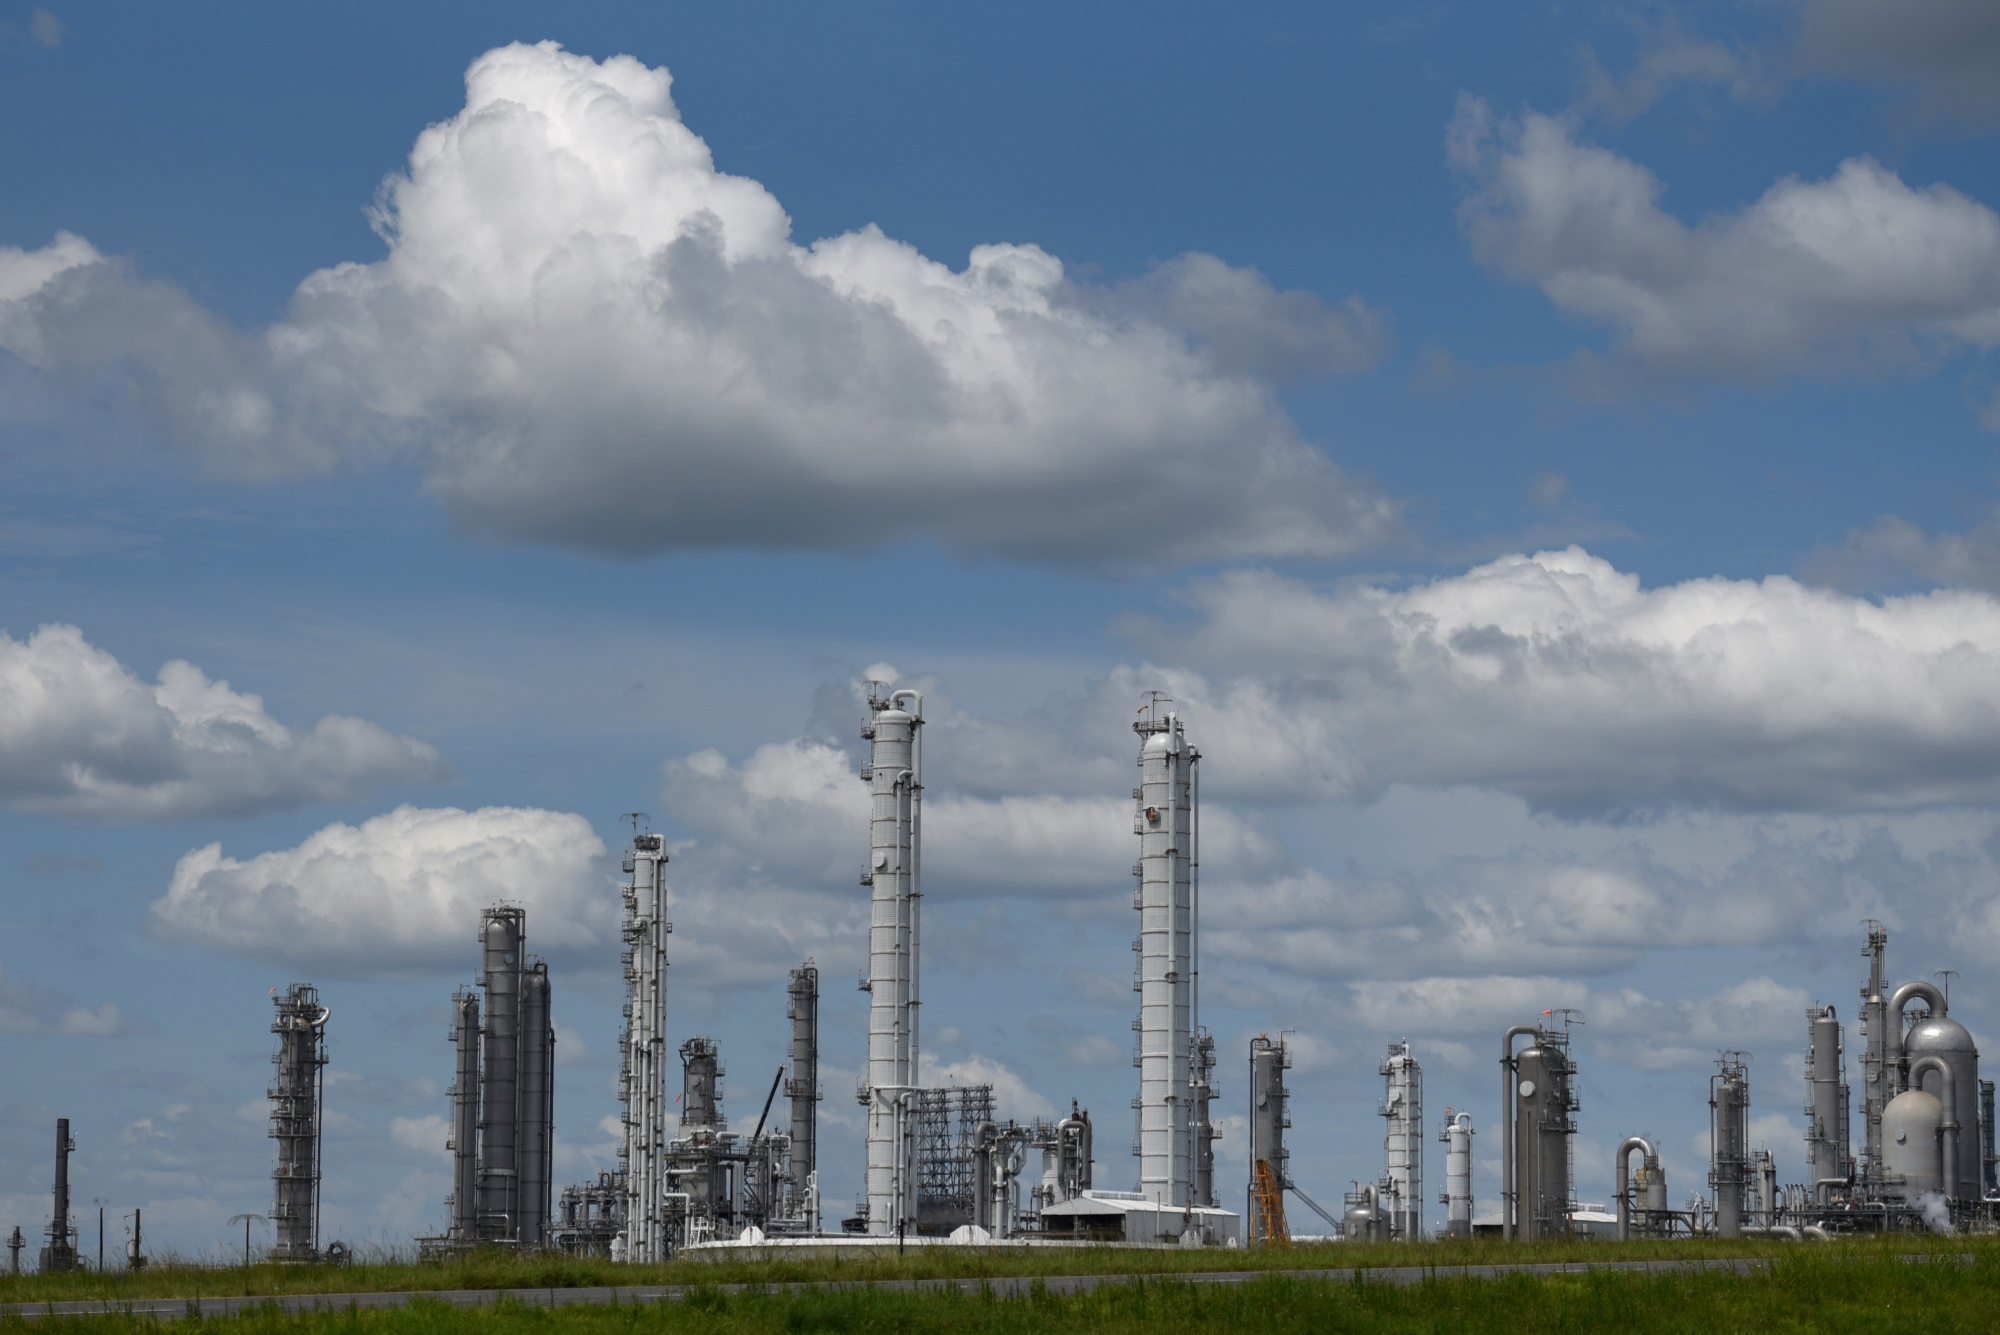 Total SE refinery in Port Arthur, Texas.